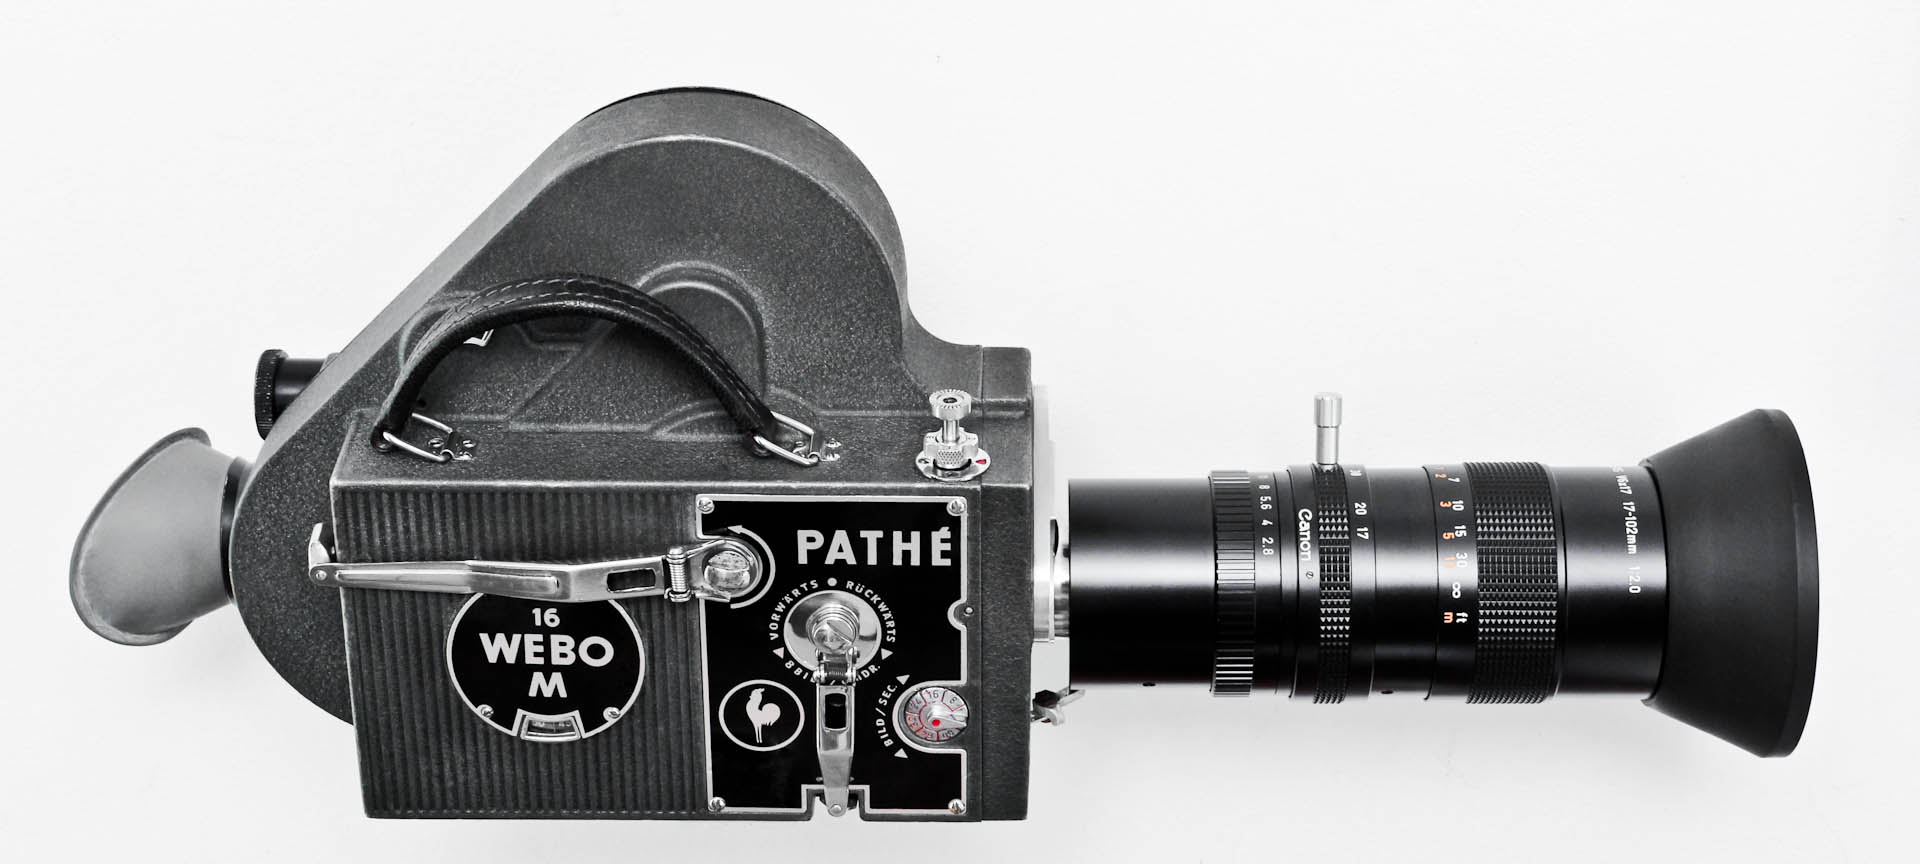 Pathe Webo 16 M